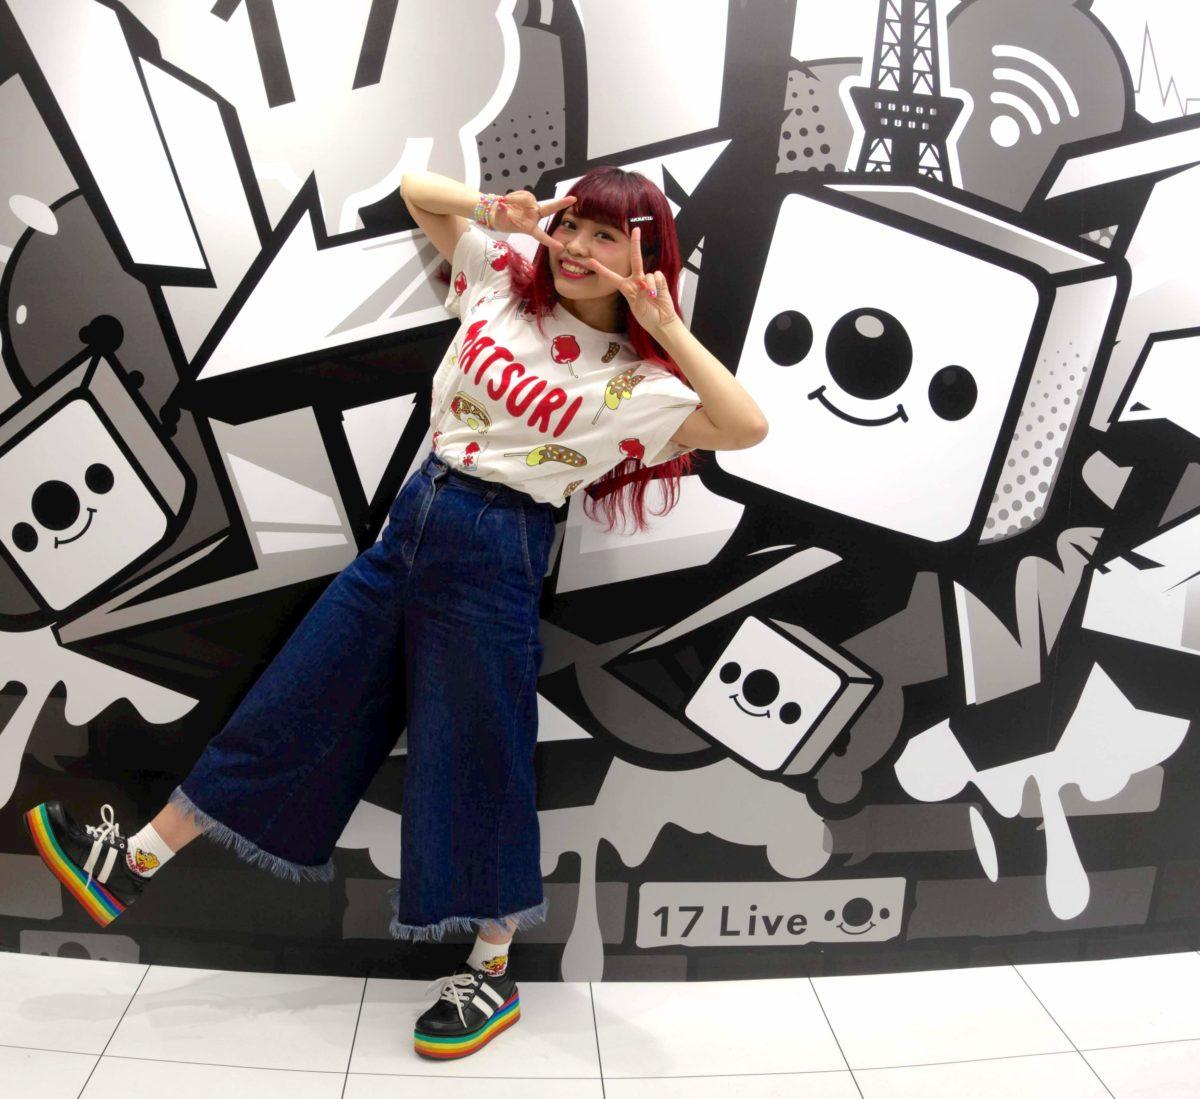 TokyoWalker掲載!誰よりもイチナナを愛する、面白可愛い赤毛の女の子